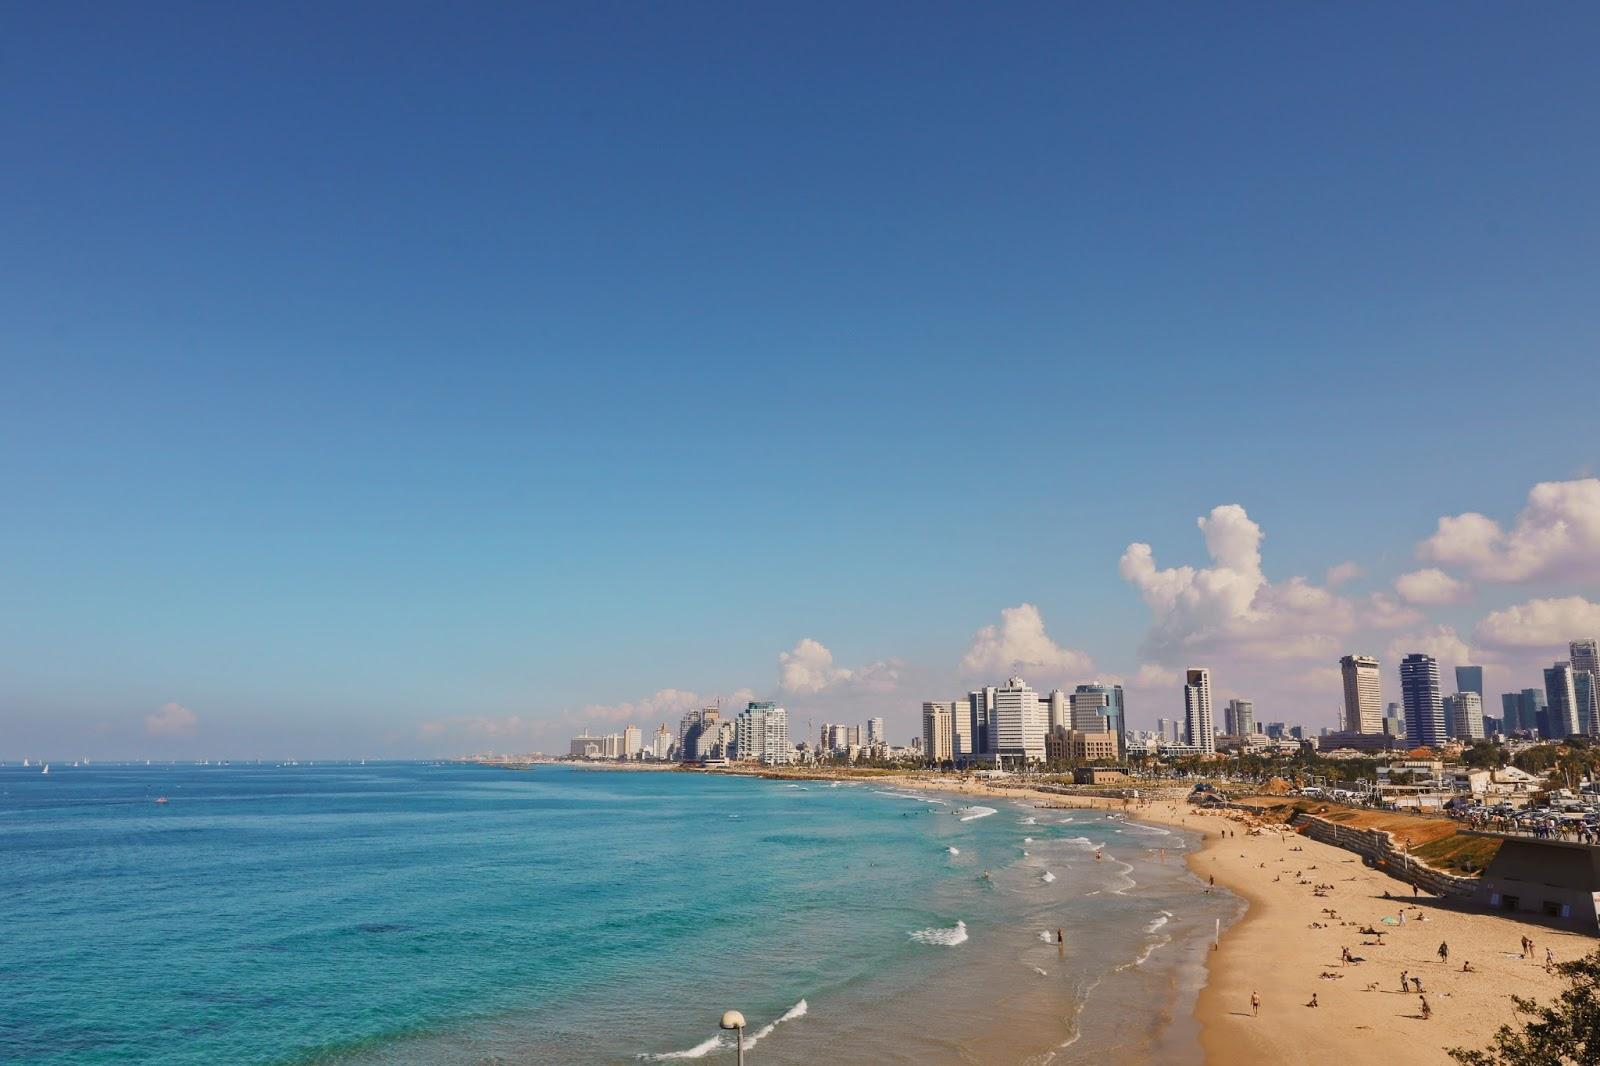 izrael, tel awiw-jafa, blog podróżniczy,